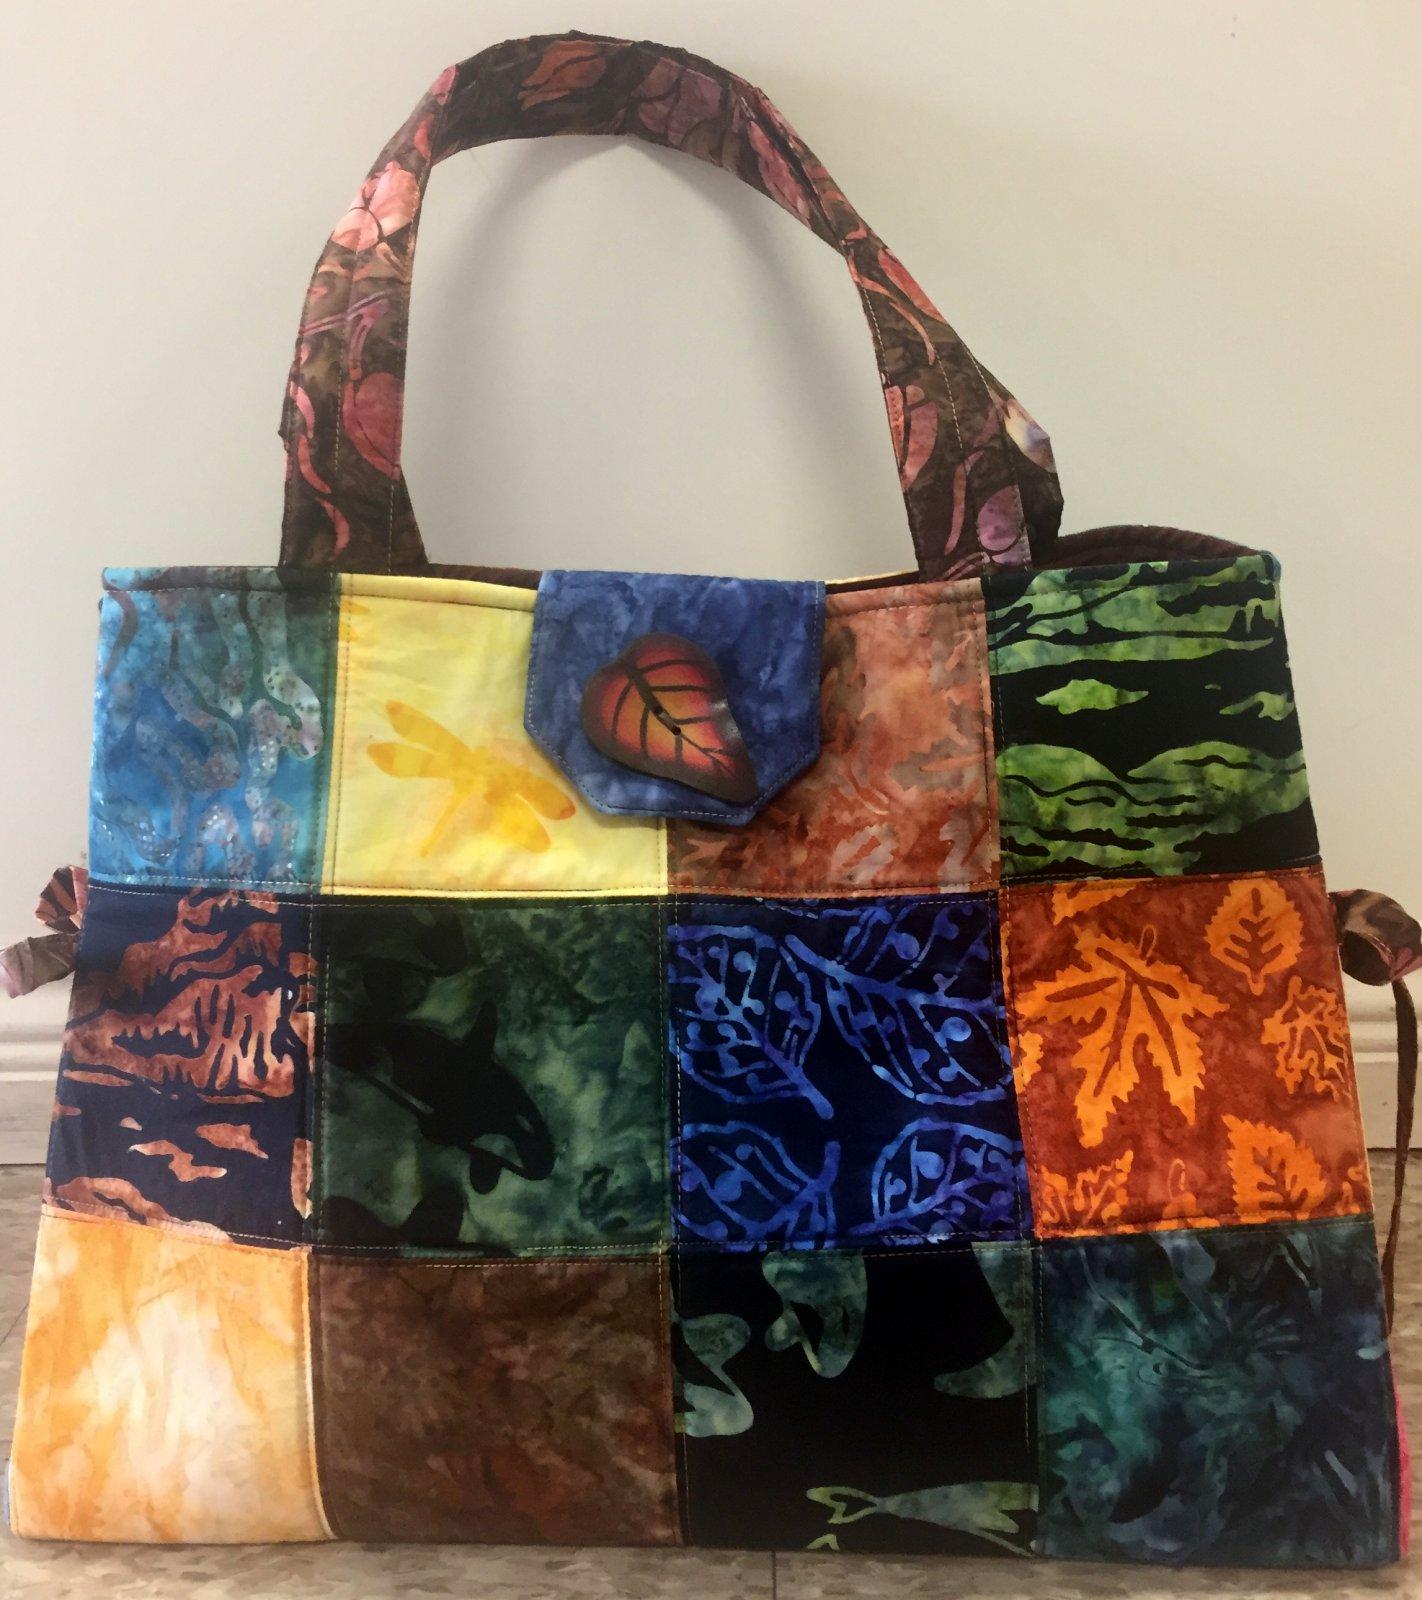 Prince Edward Island Charming Bag Kit